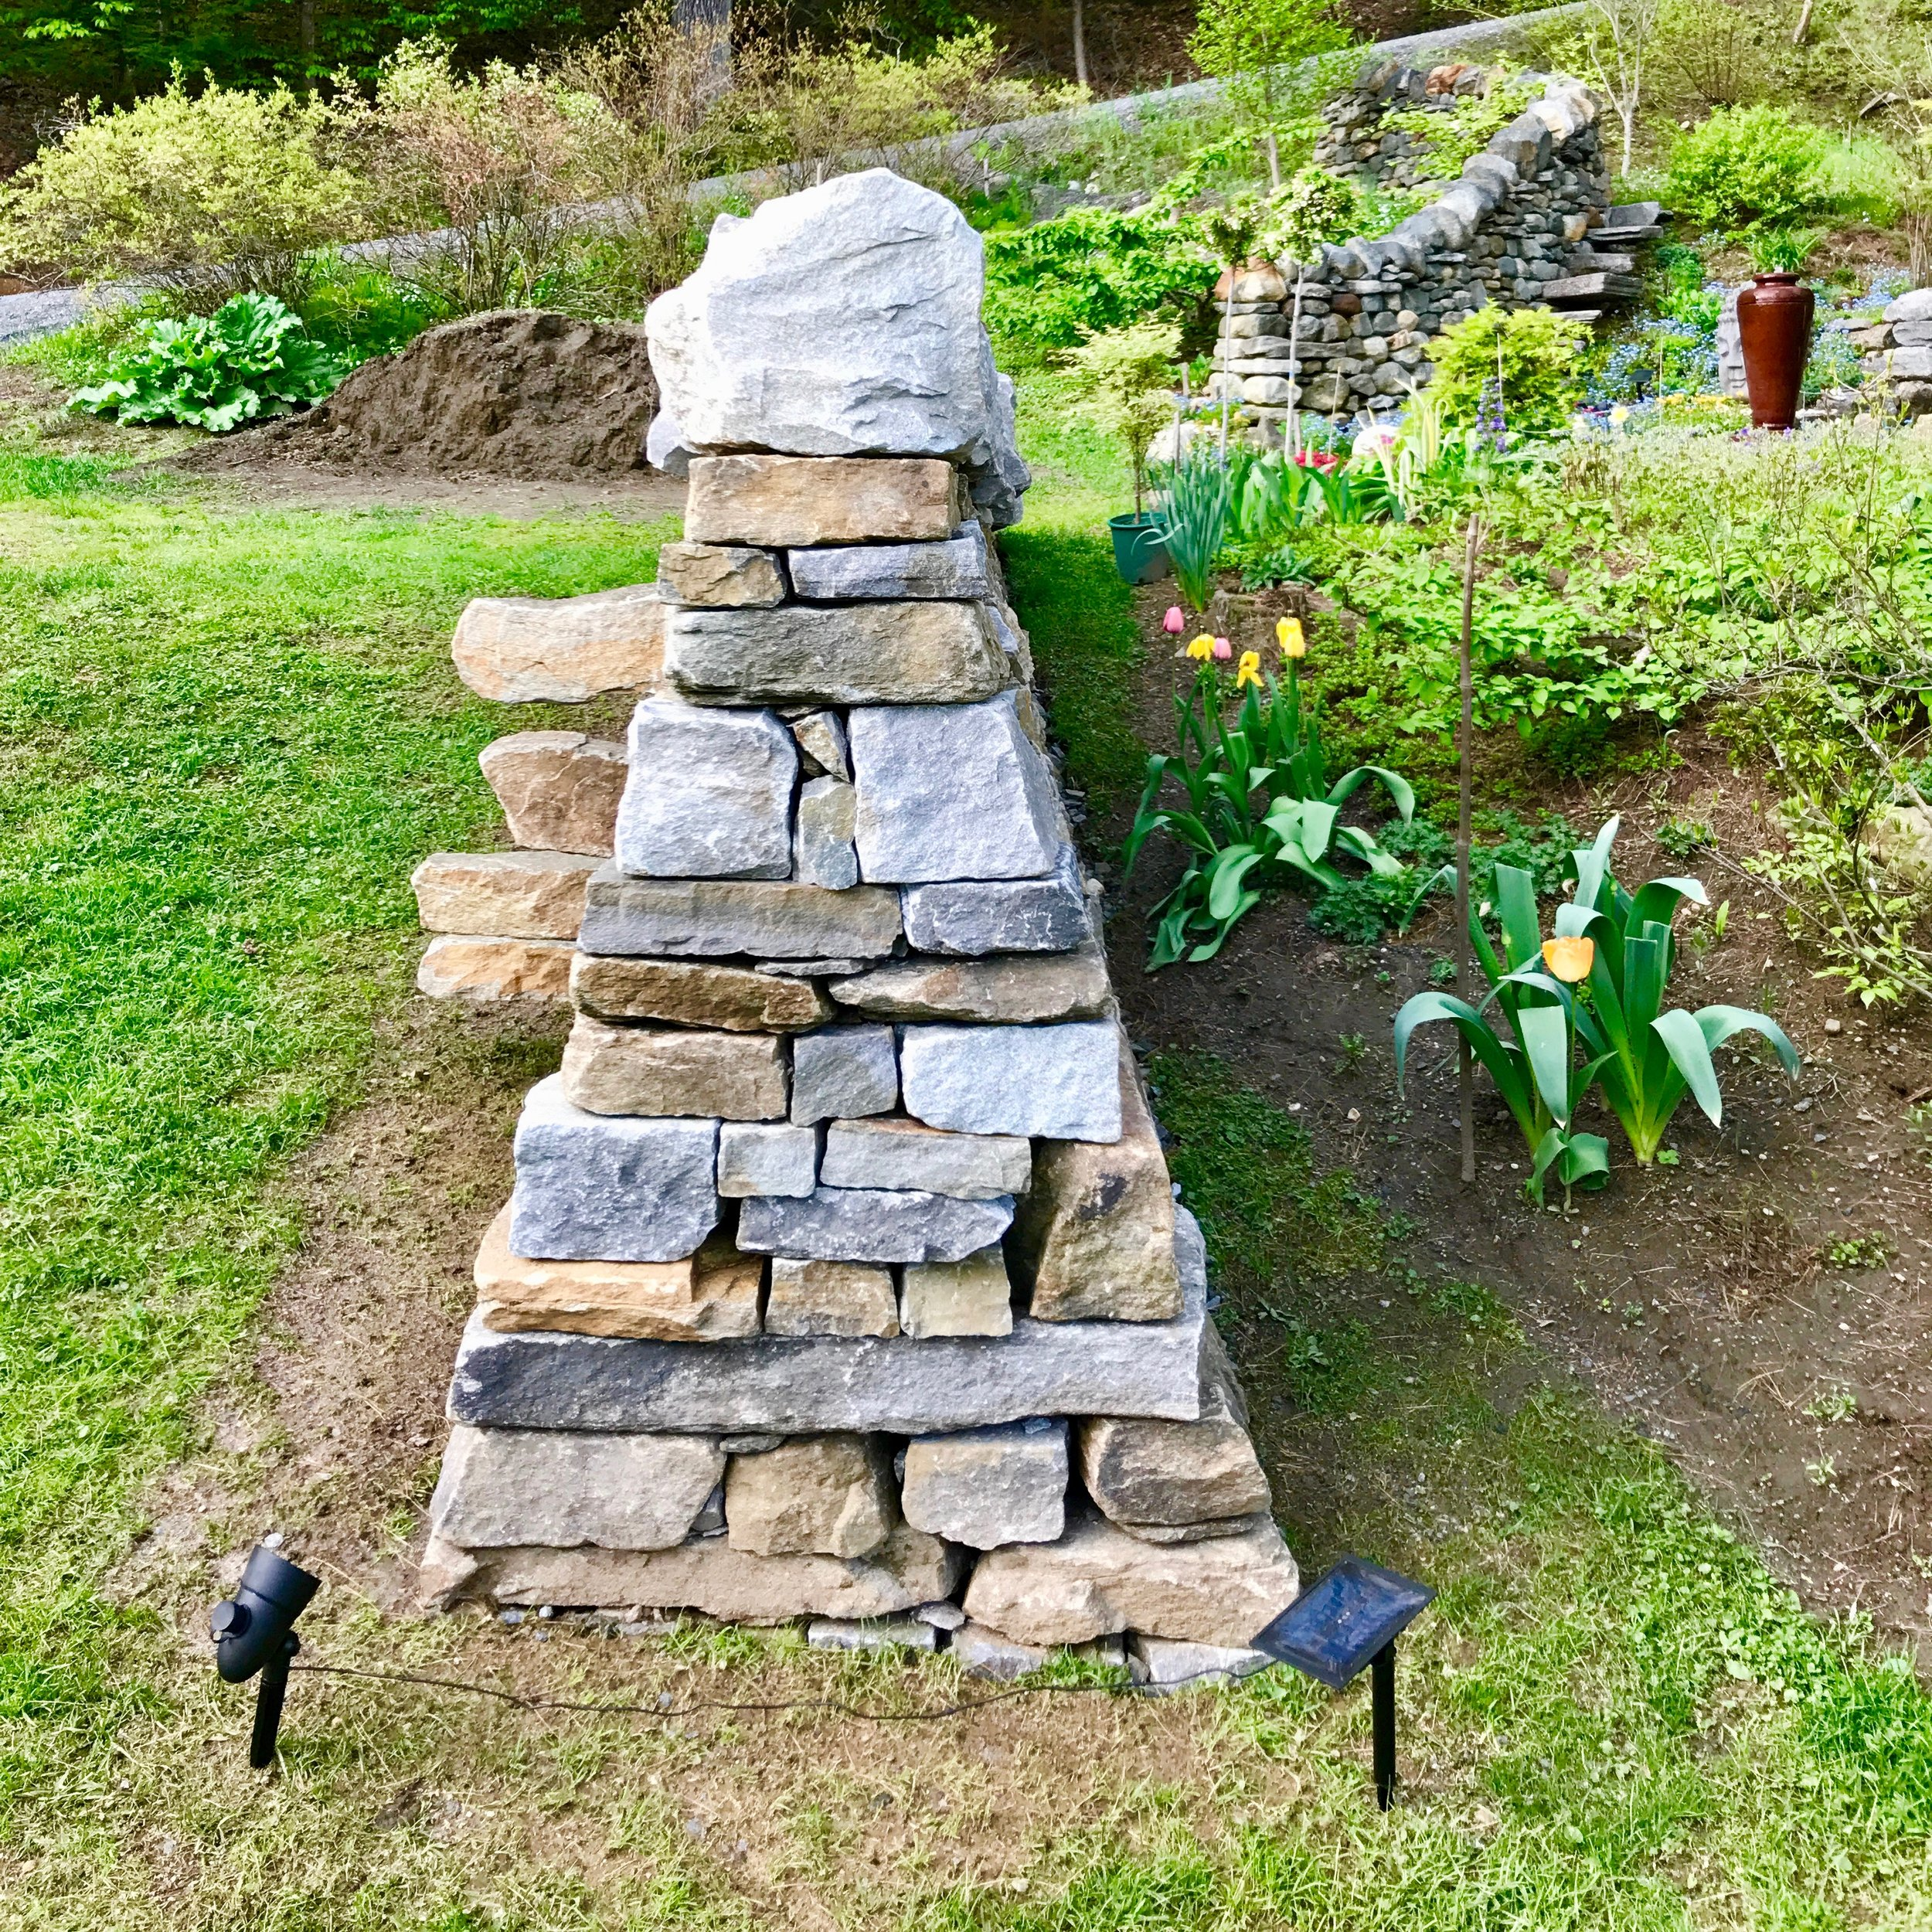 dan-snow-stoneworks-puzzle-post-isosceles-wall - 4.jpg